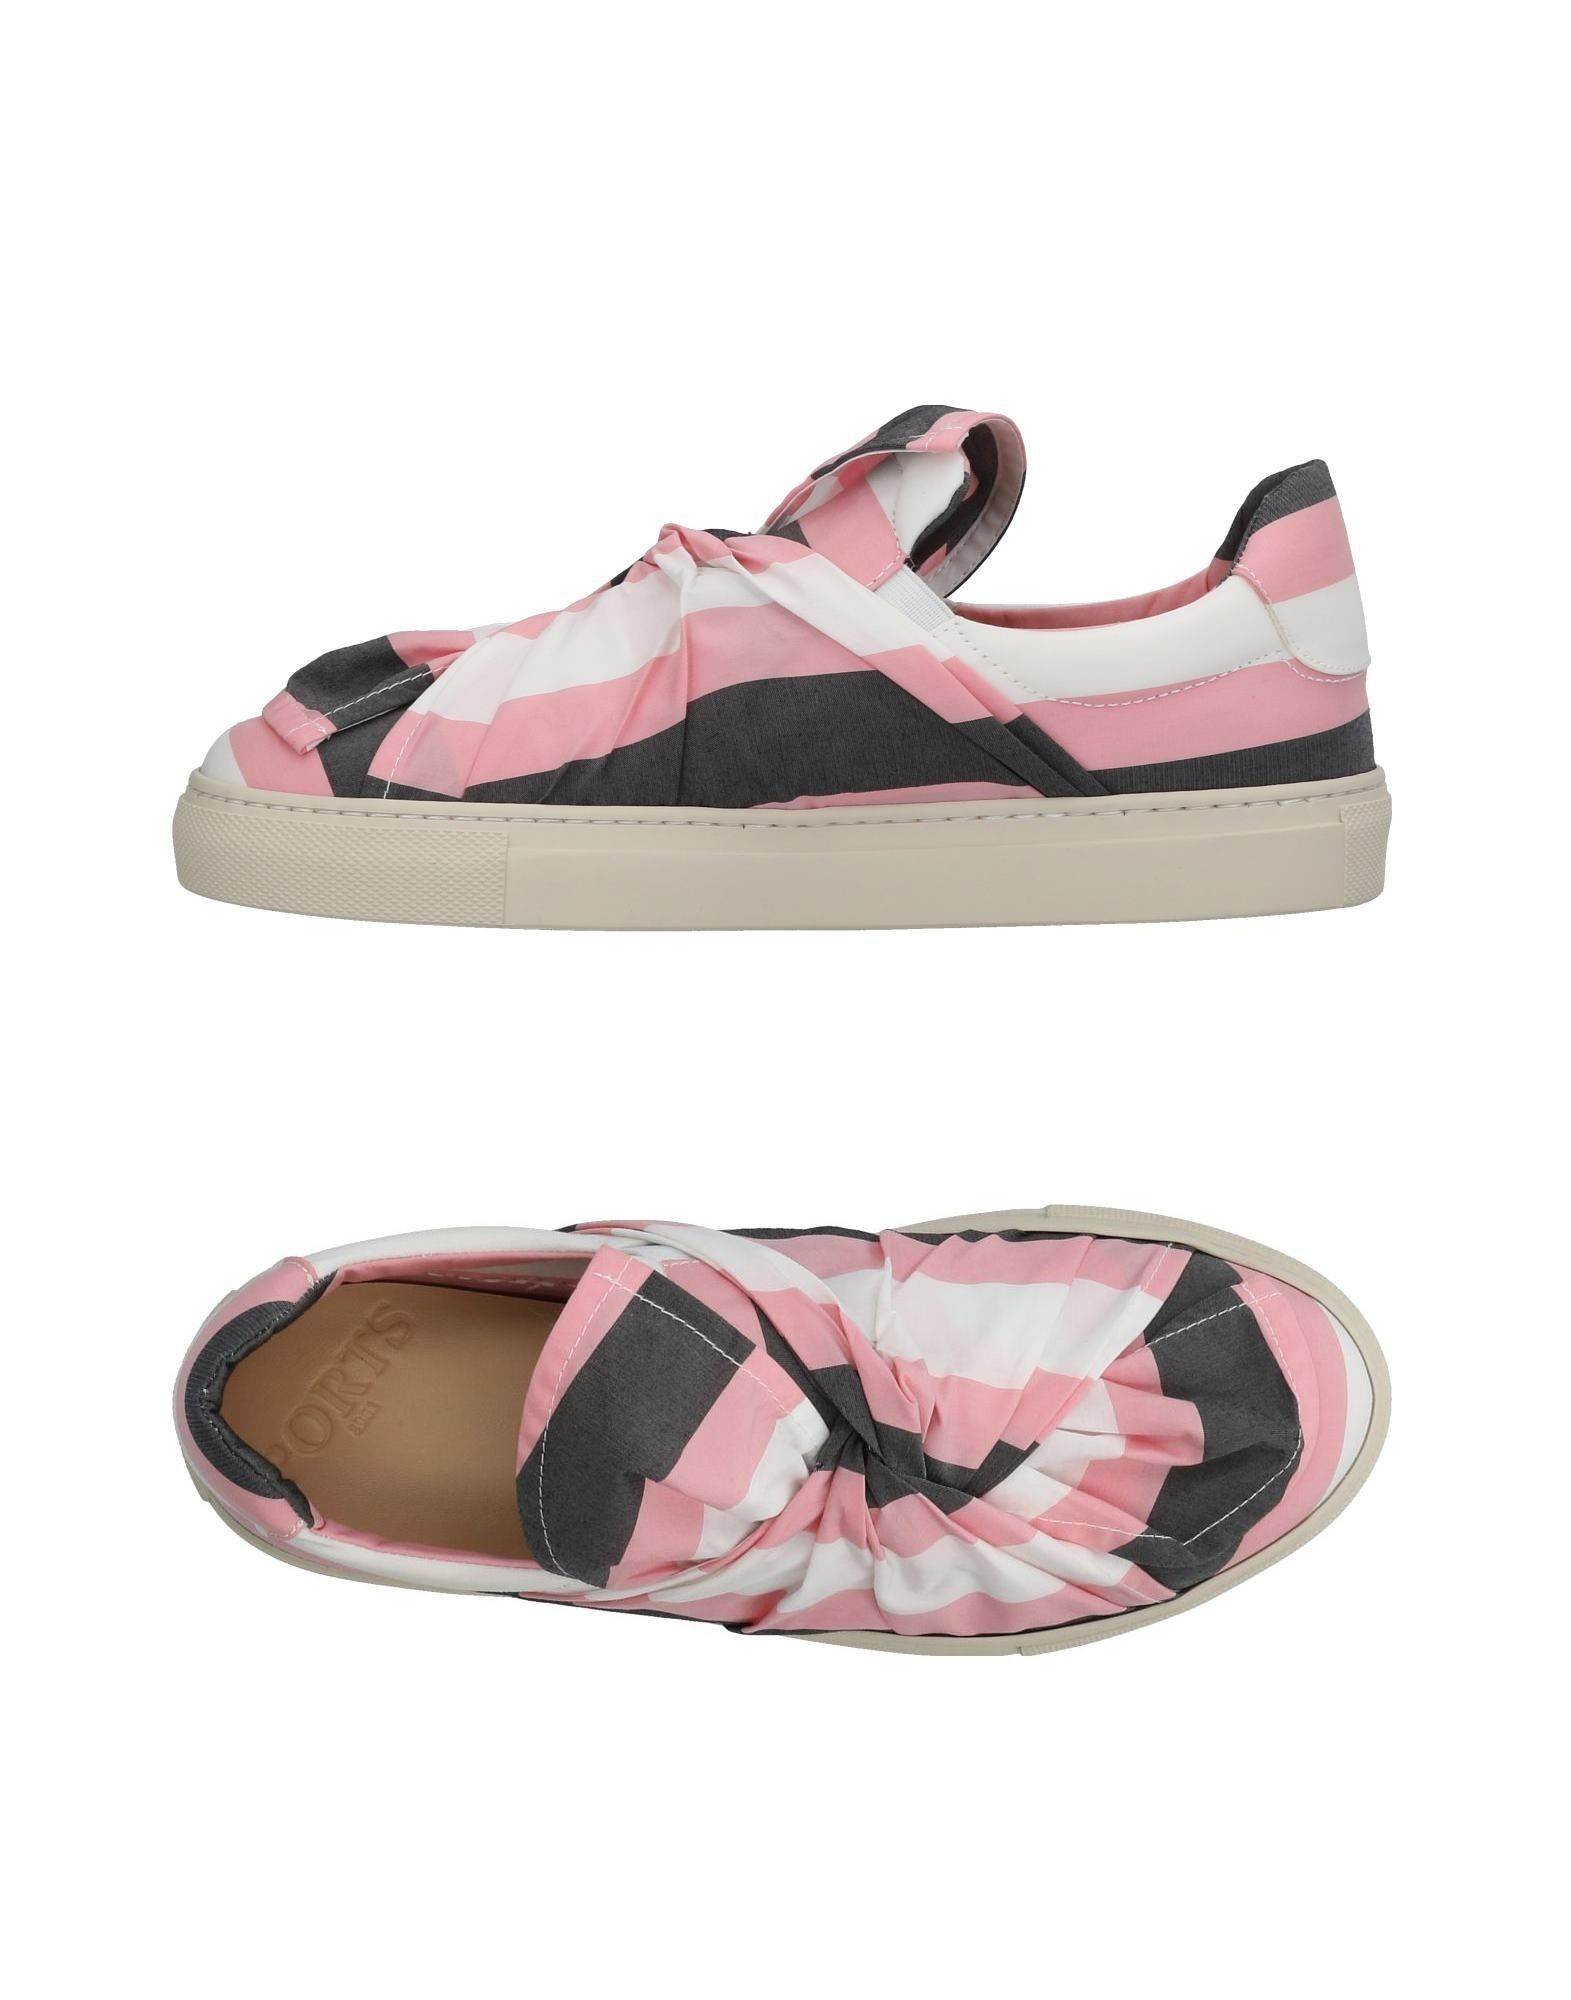 Sneakers Ports 1961 Donna - Acquista online su